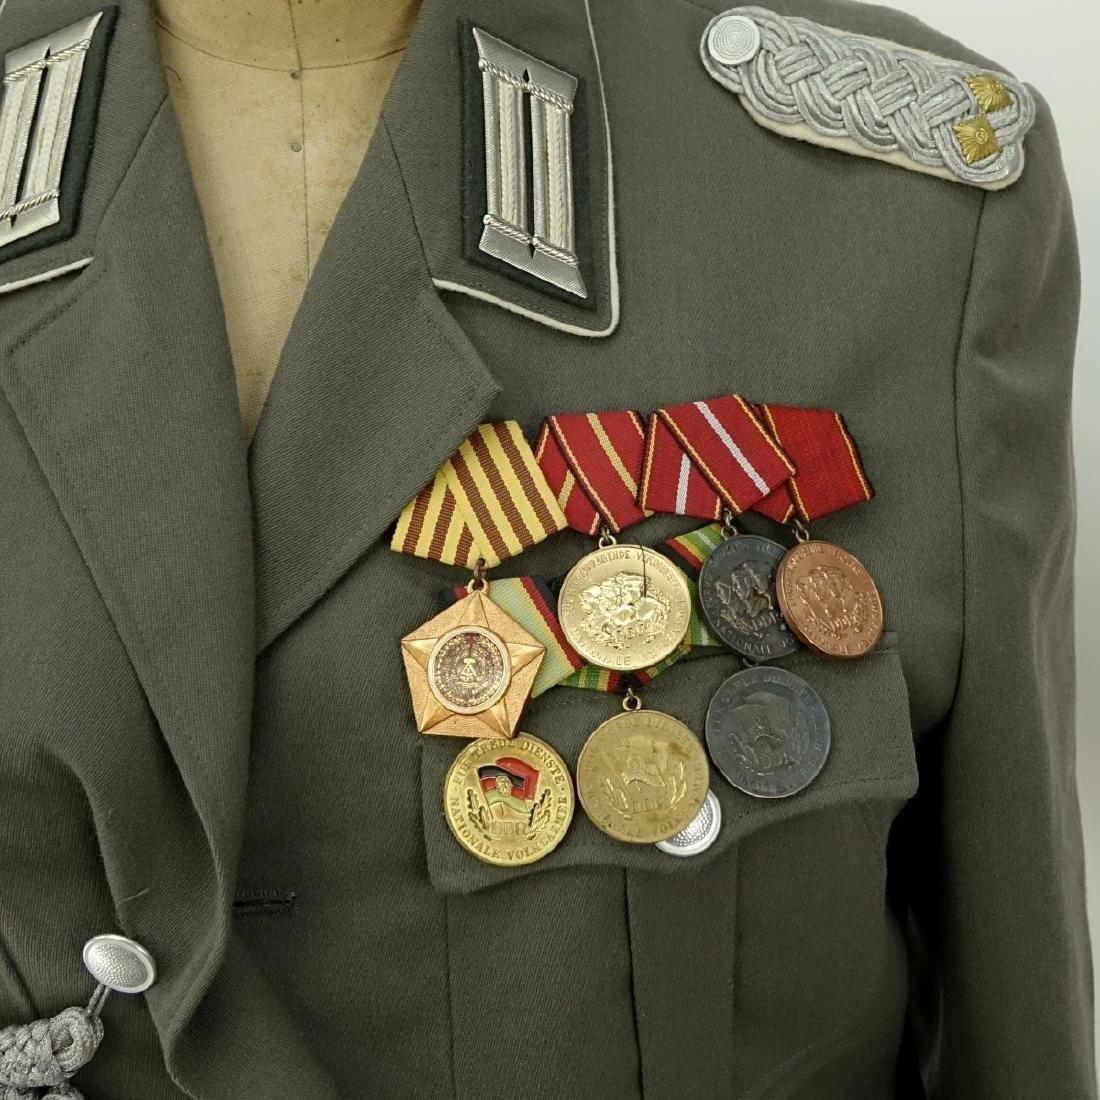 Russian Soviet Era Military Uniform Set With Metal - 3